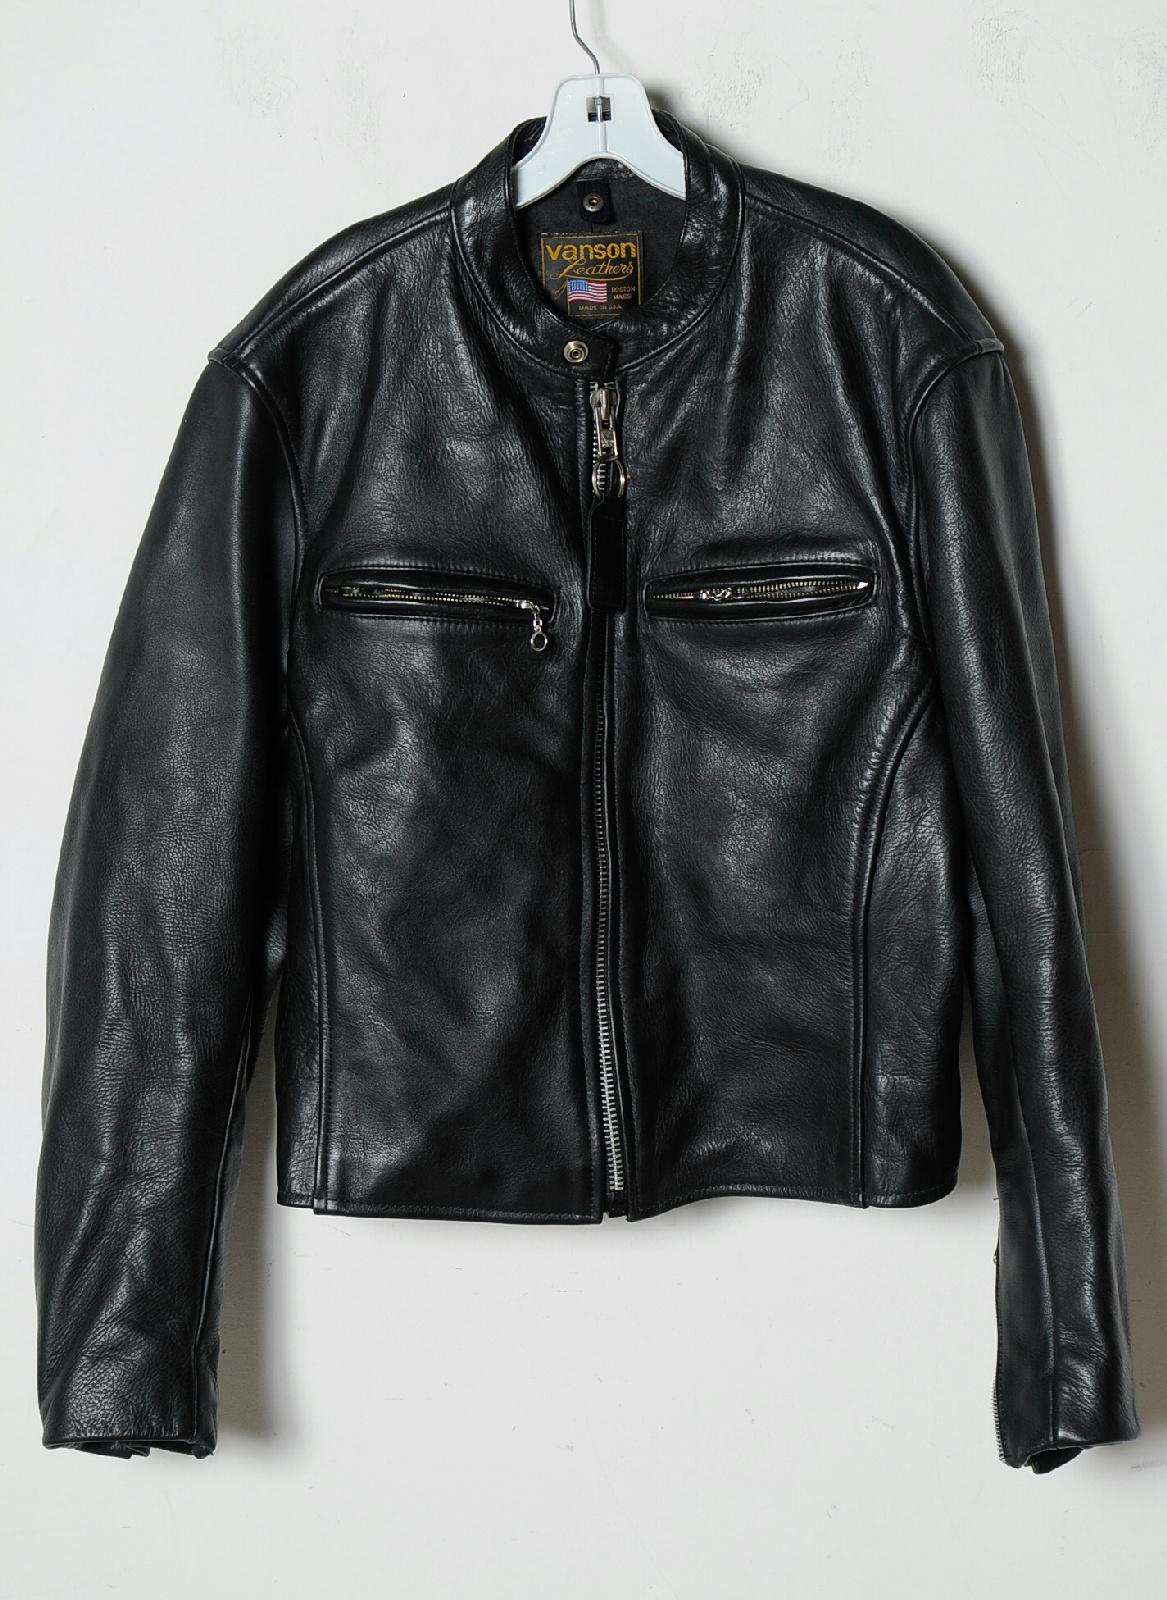 Heavy leather motorcycle jacket